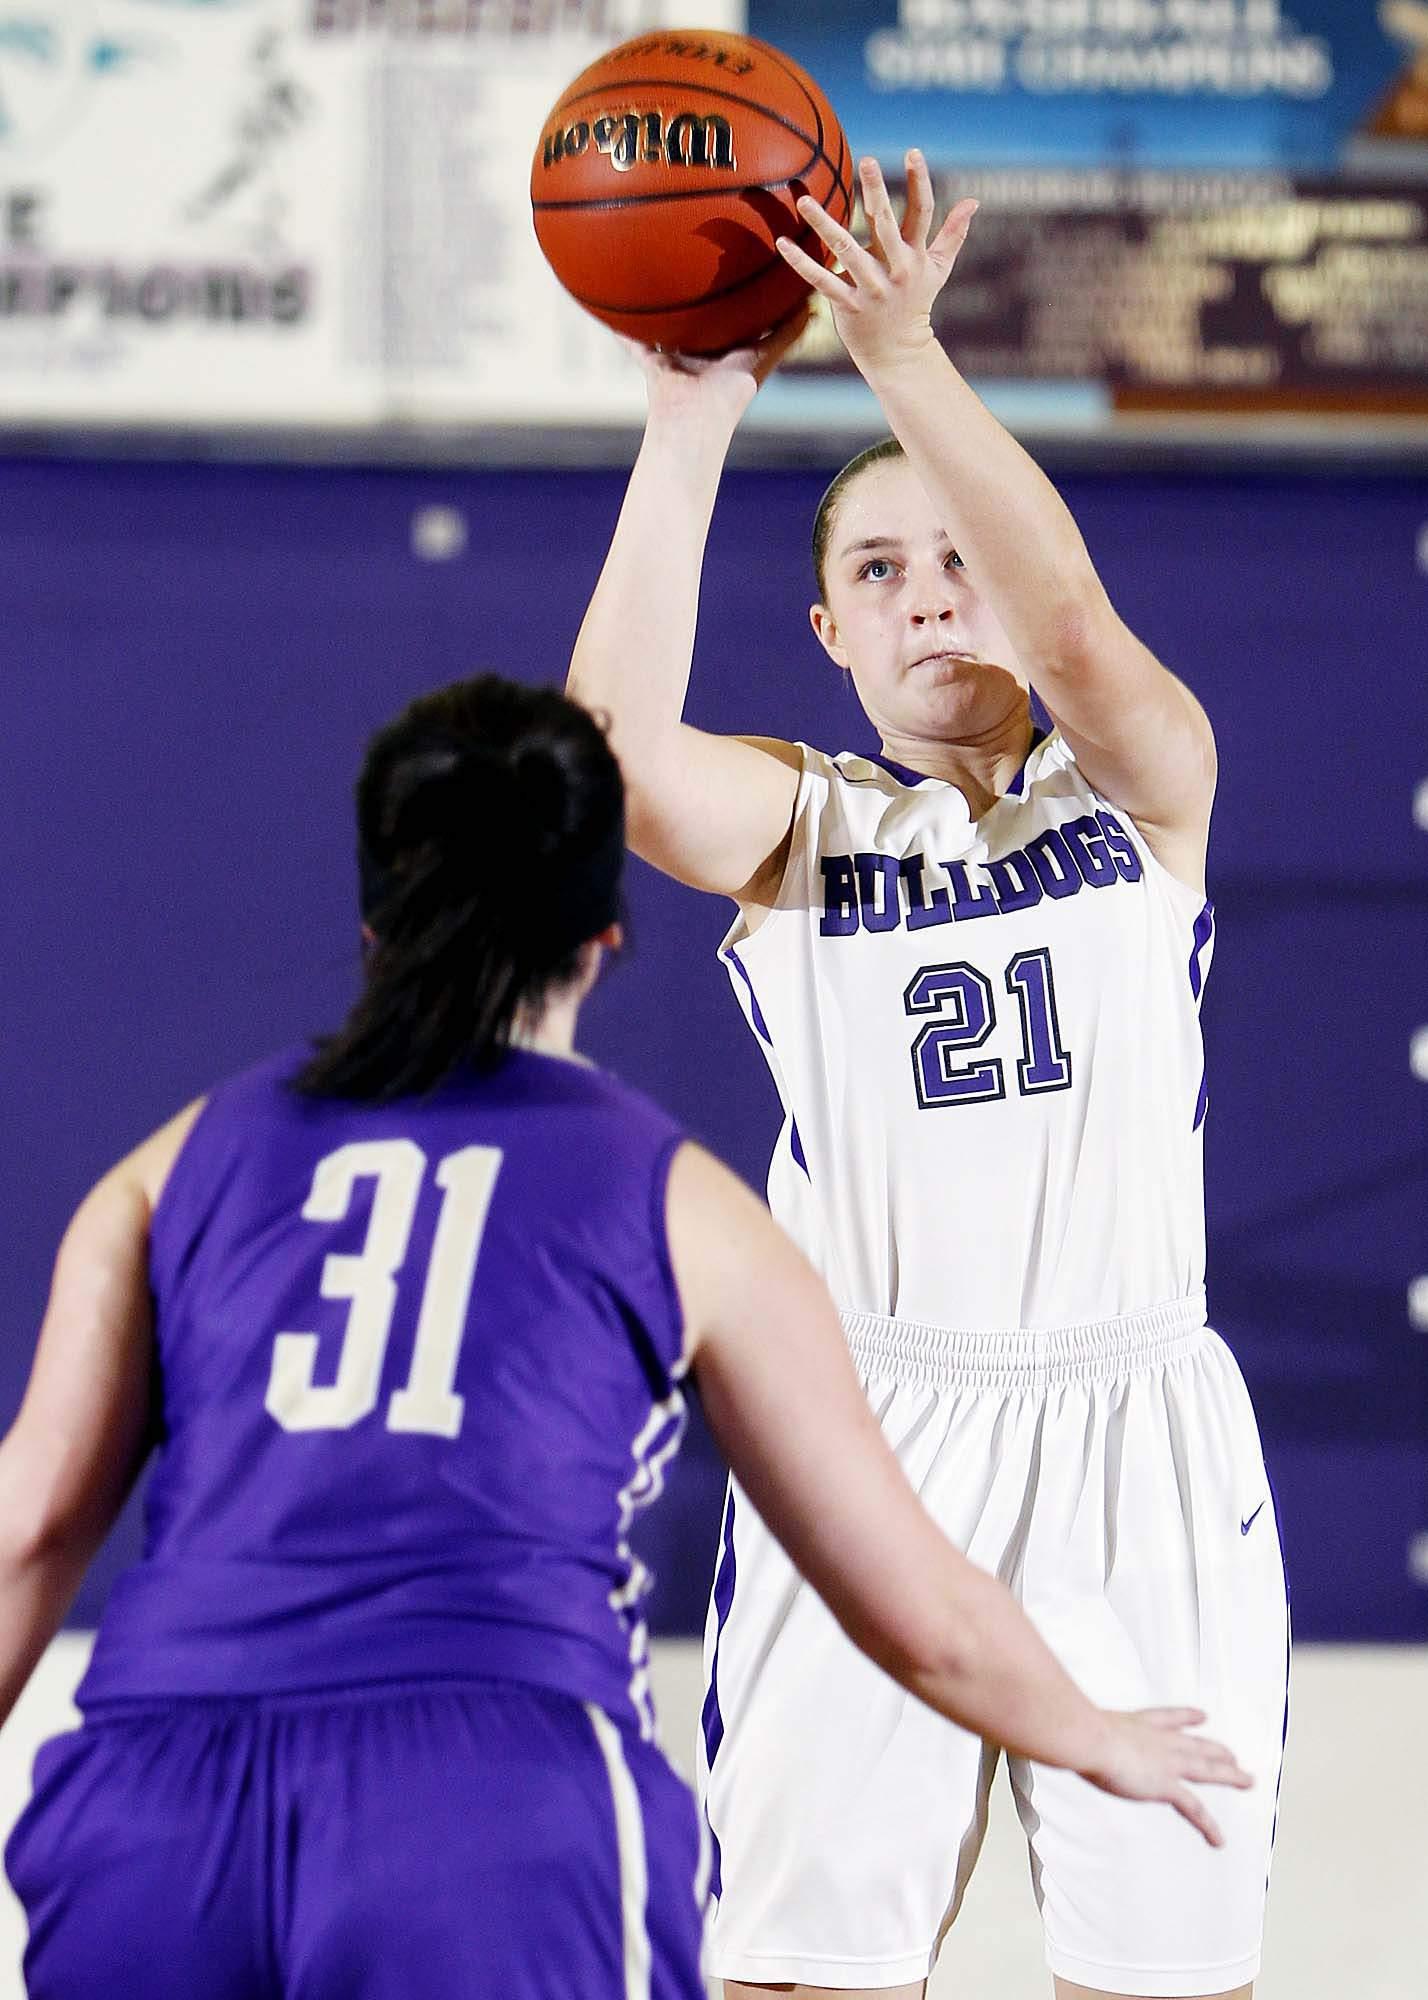 Jess Hopson and the Harrisburg High School girls' basketball team grabbed the top spot in the first Associated Press girls' basketball poll